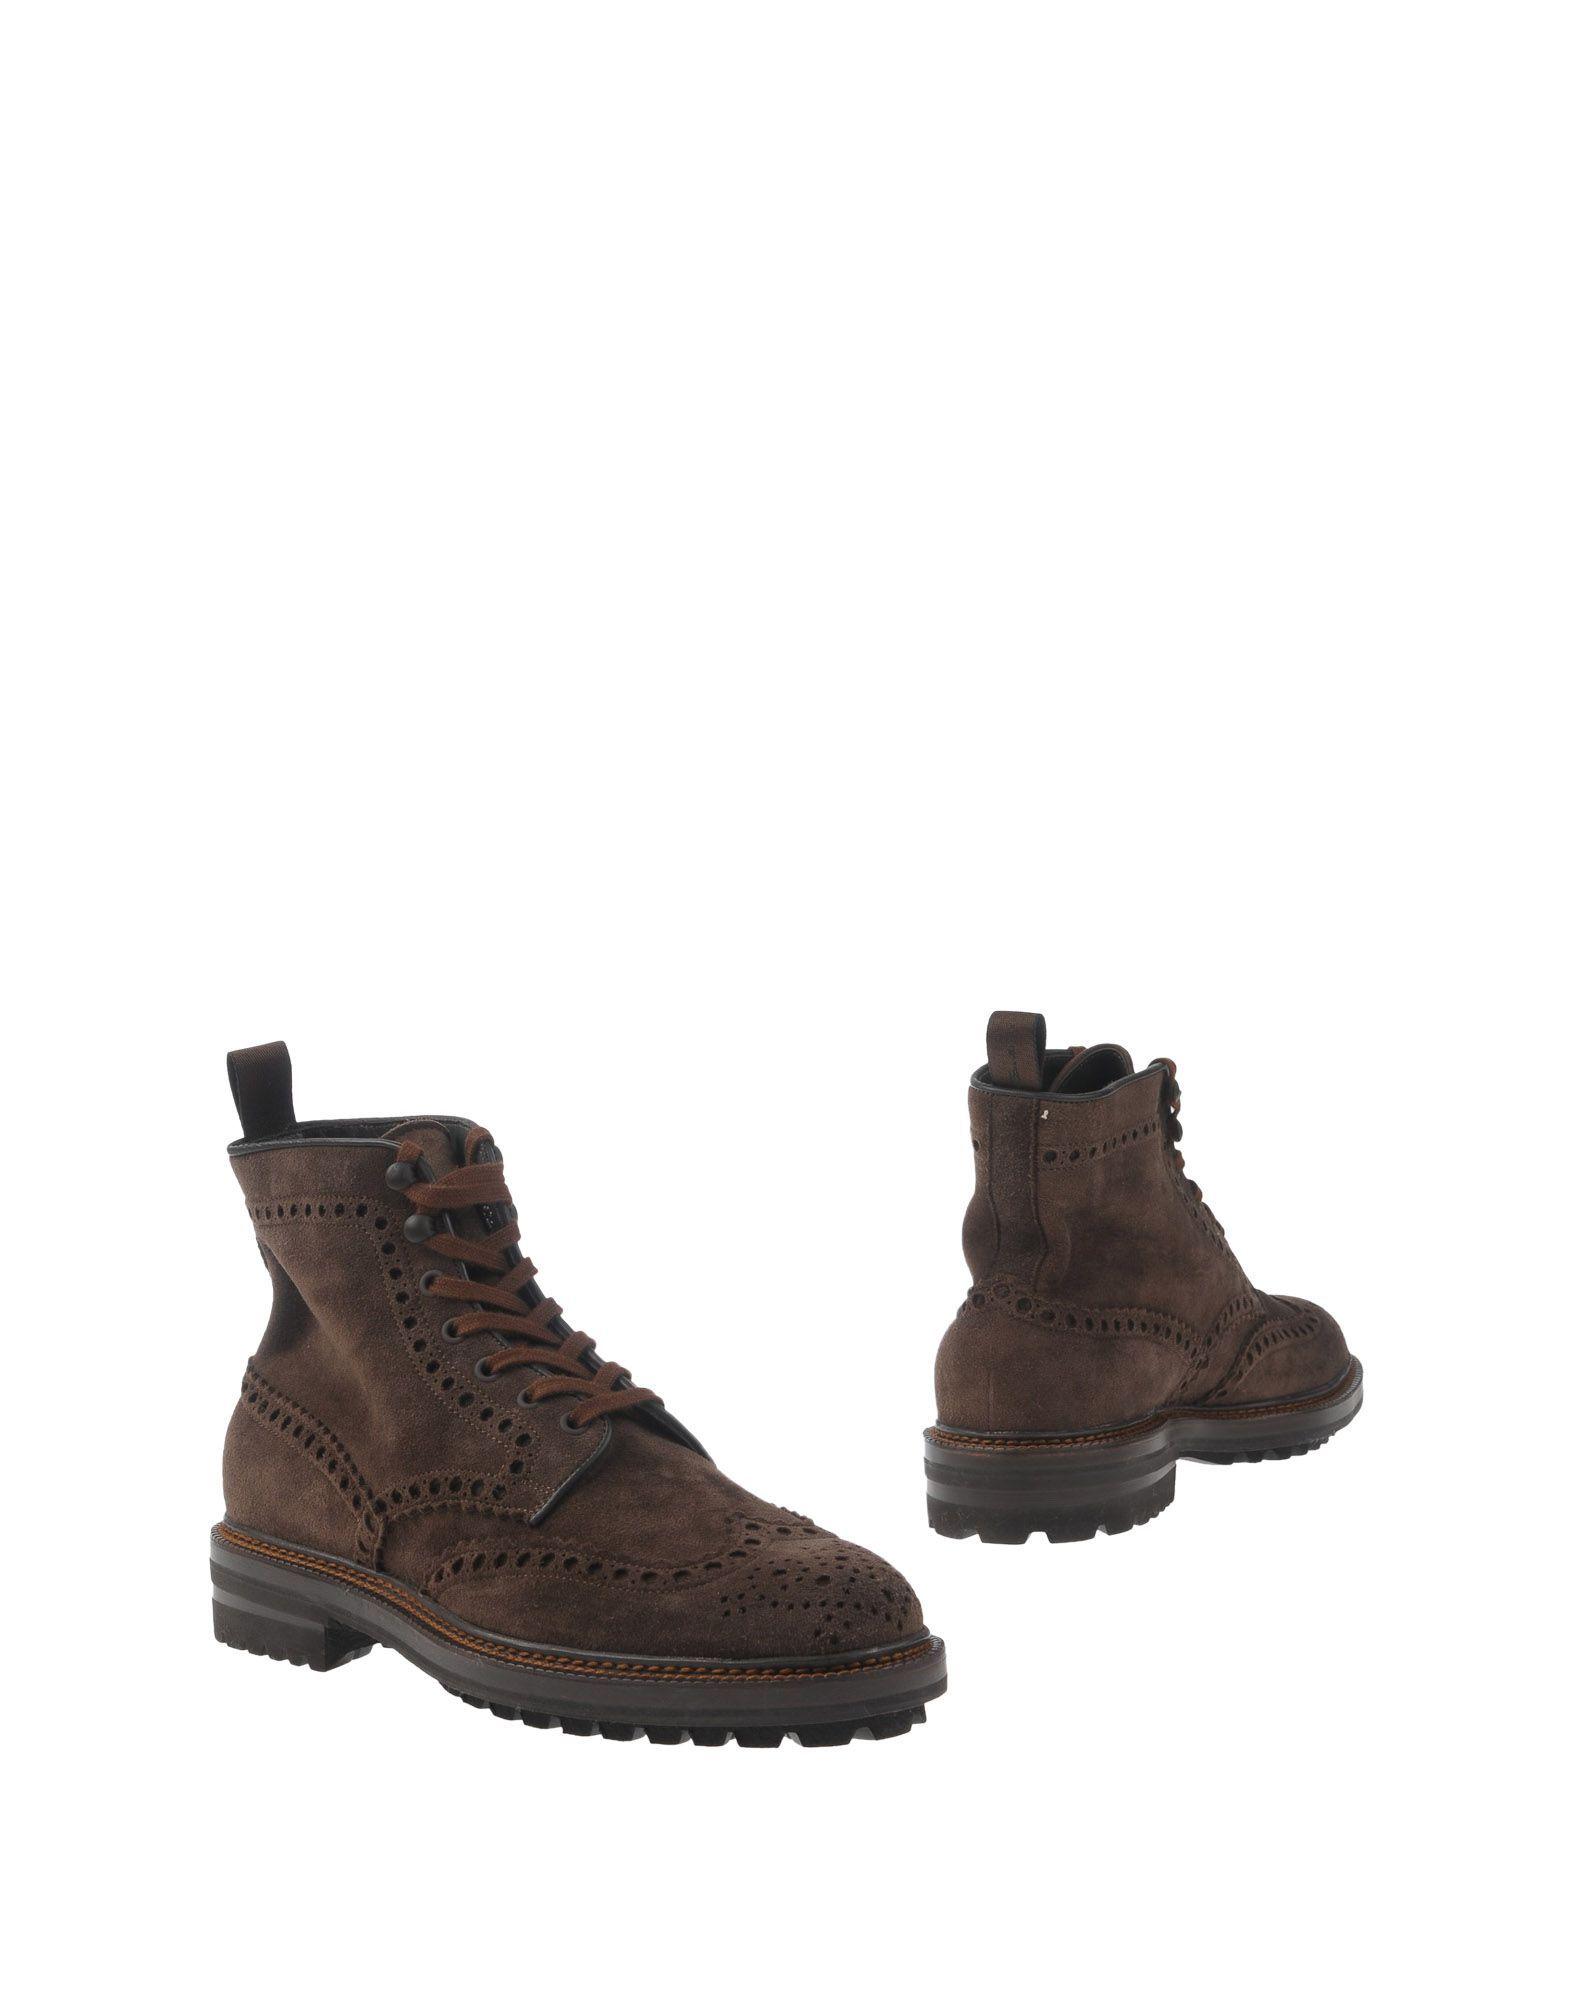 Santoni Dark Brown Leather Boots